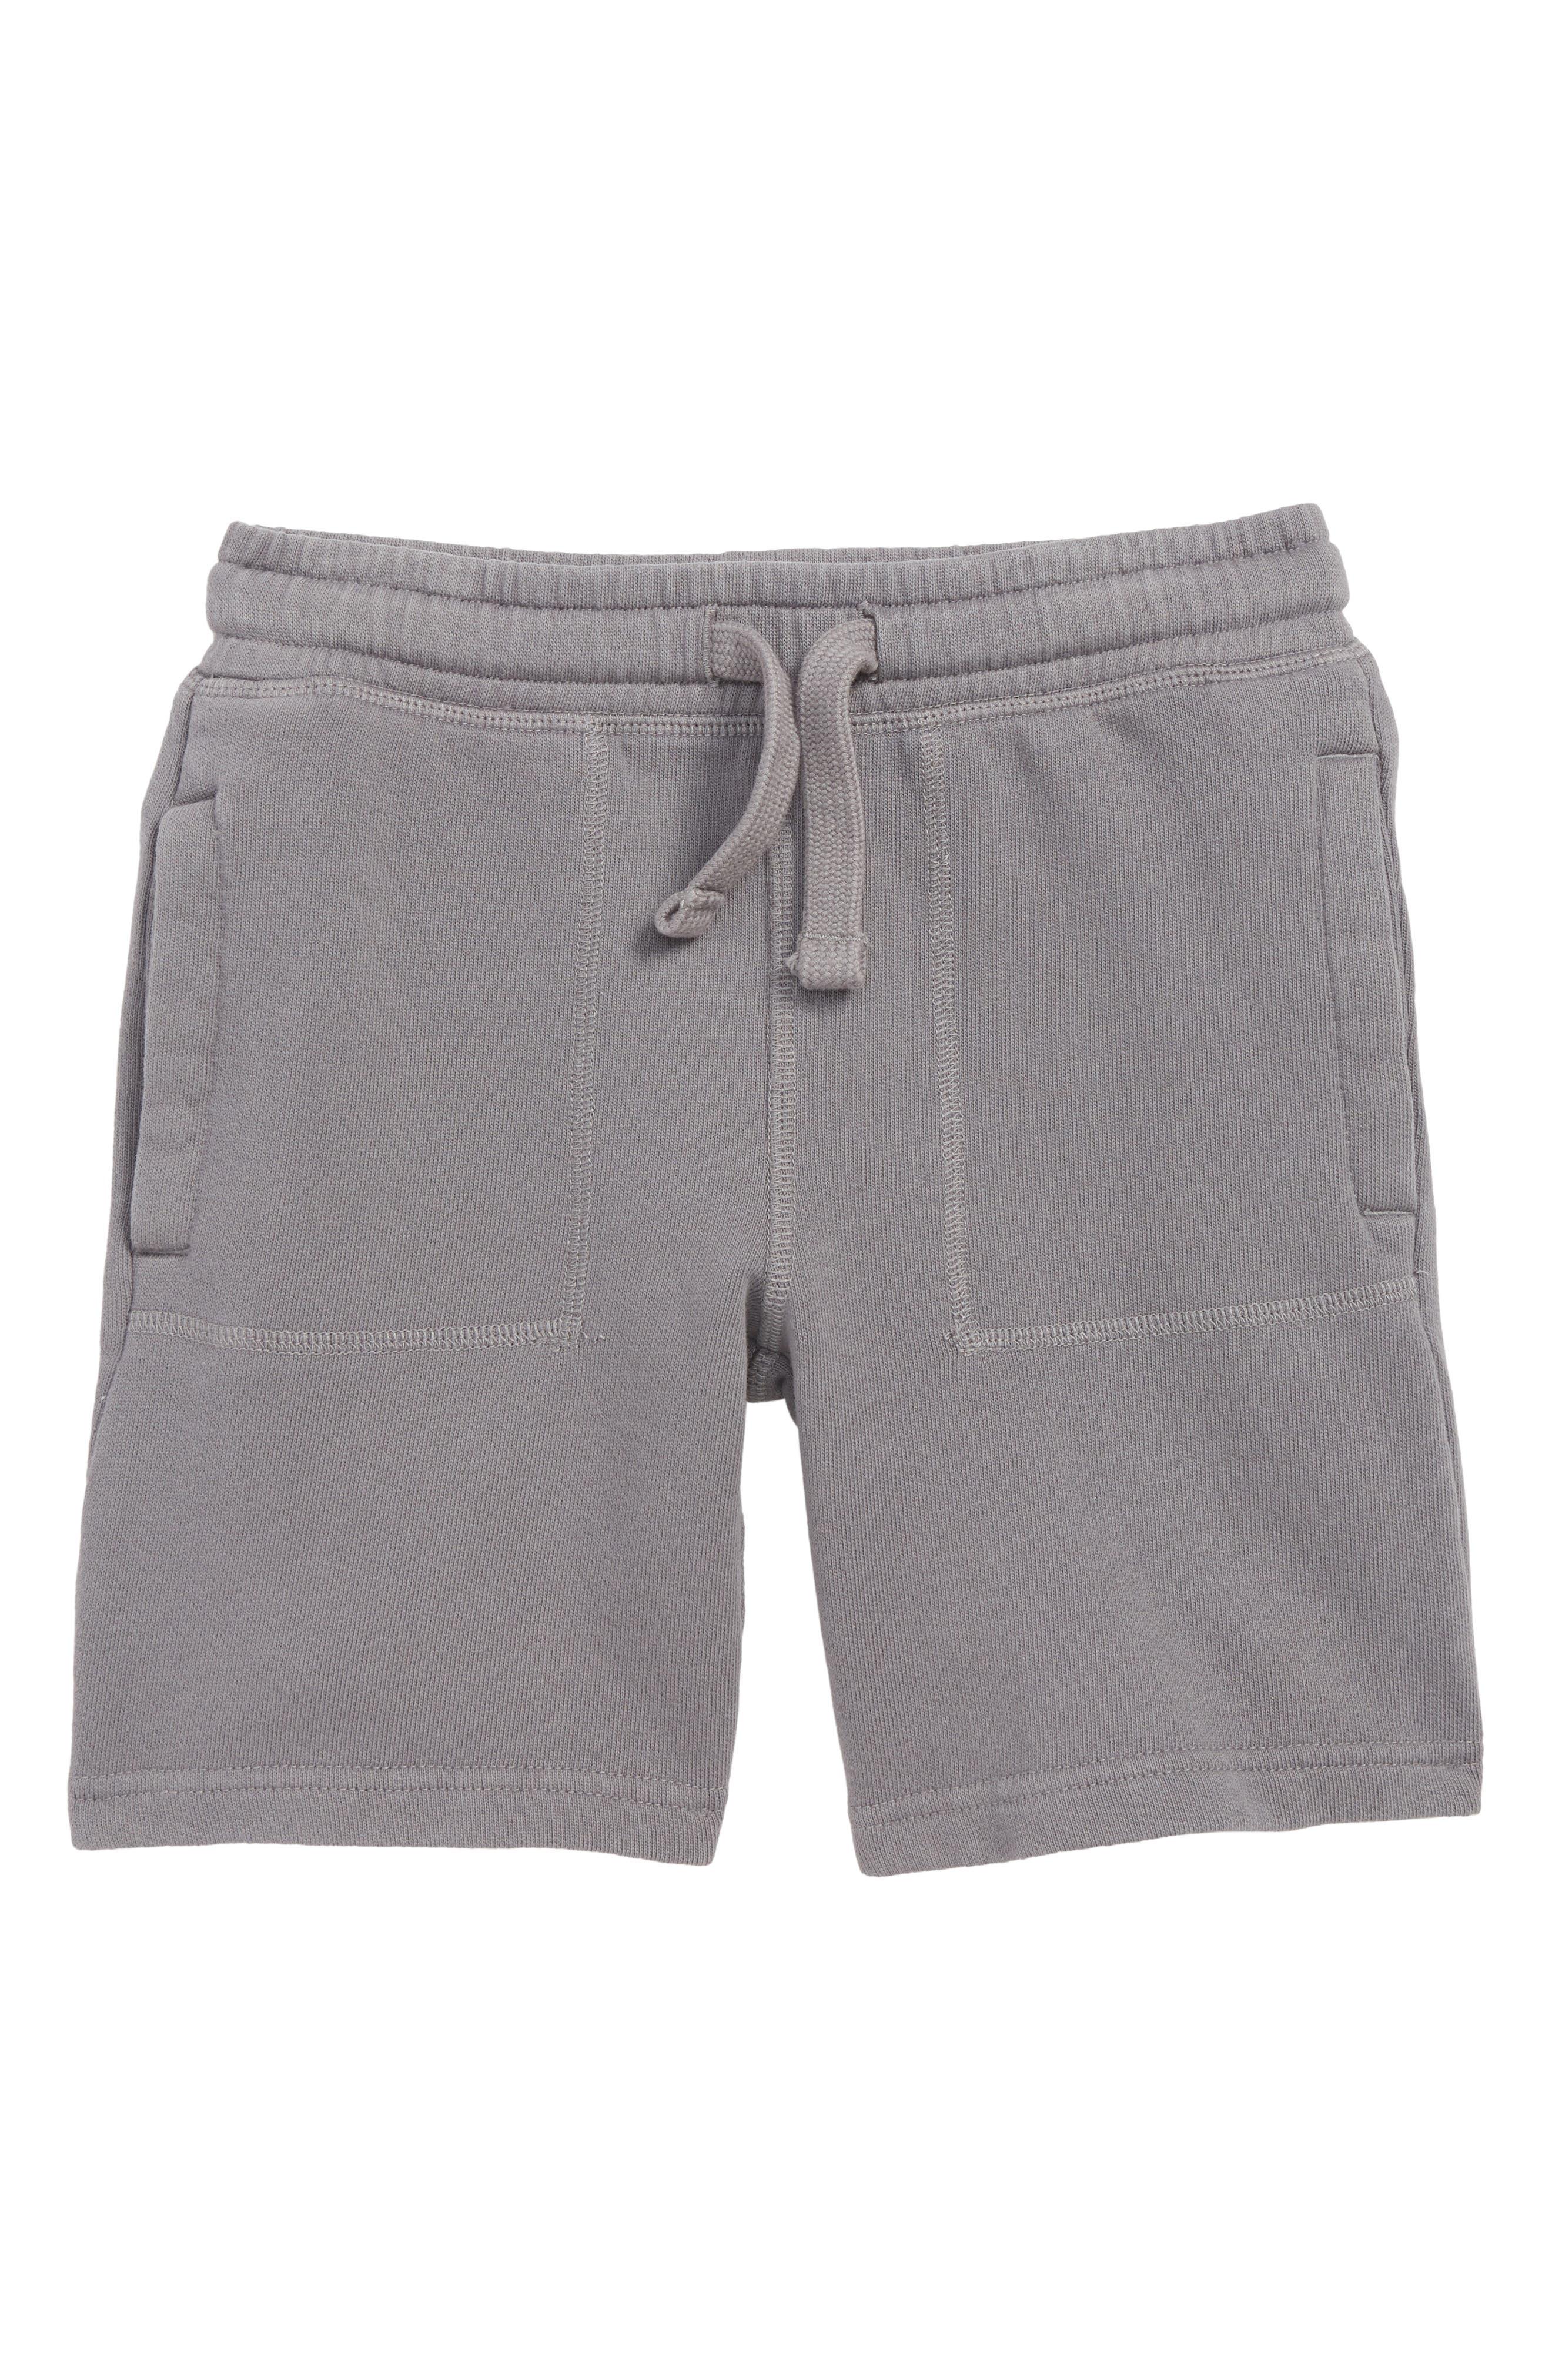 MINI BODEN,                             Garment Dyed Sweat Shorts,                             Main thumbnail 1, color,                             PEWTER GREY